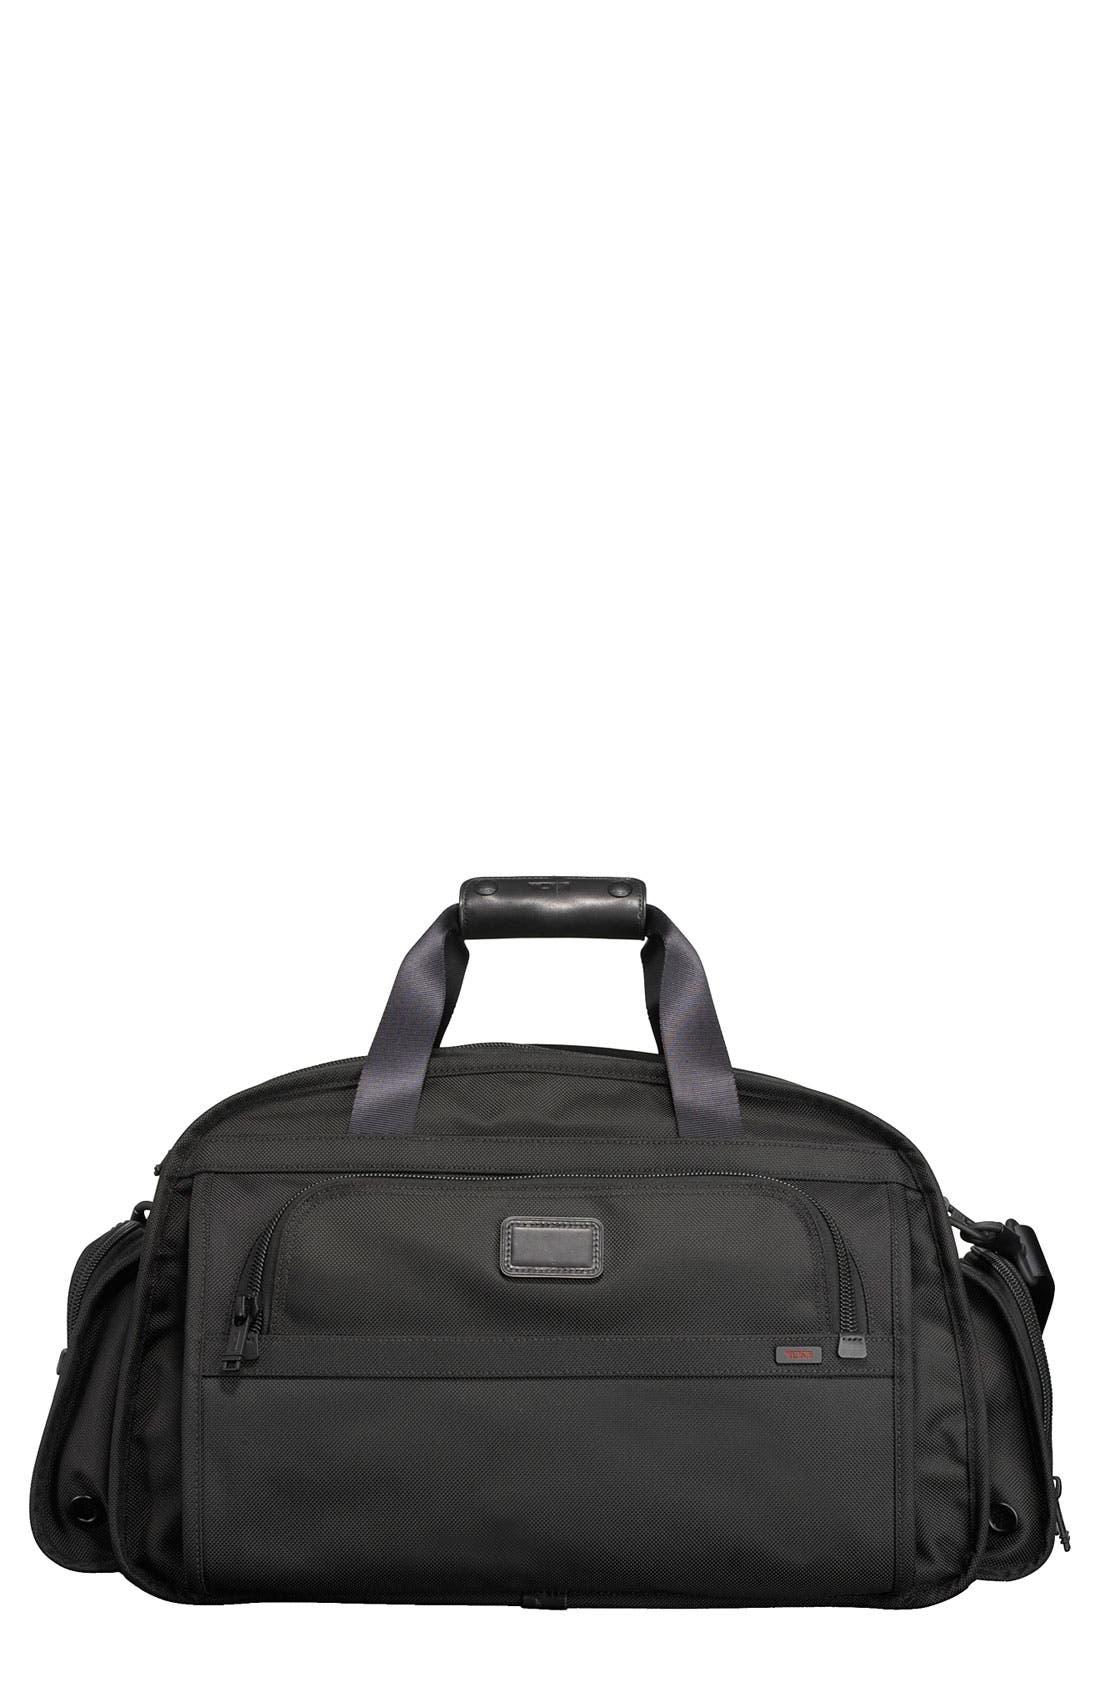 Alternate Image 1 Selected - Tumi 'Alpha' Sport Duffel Bag